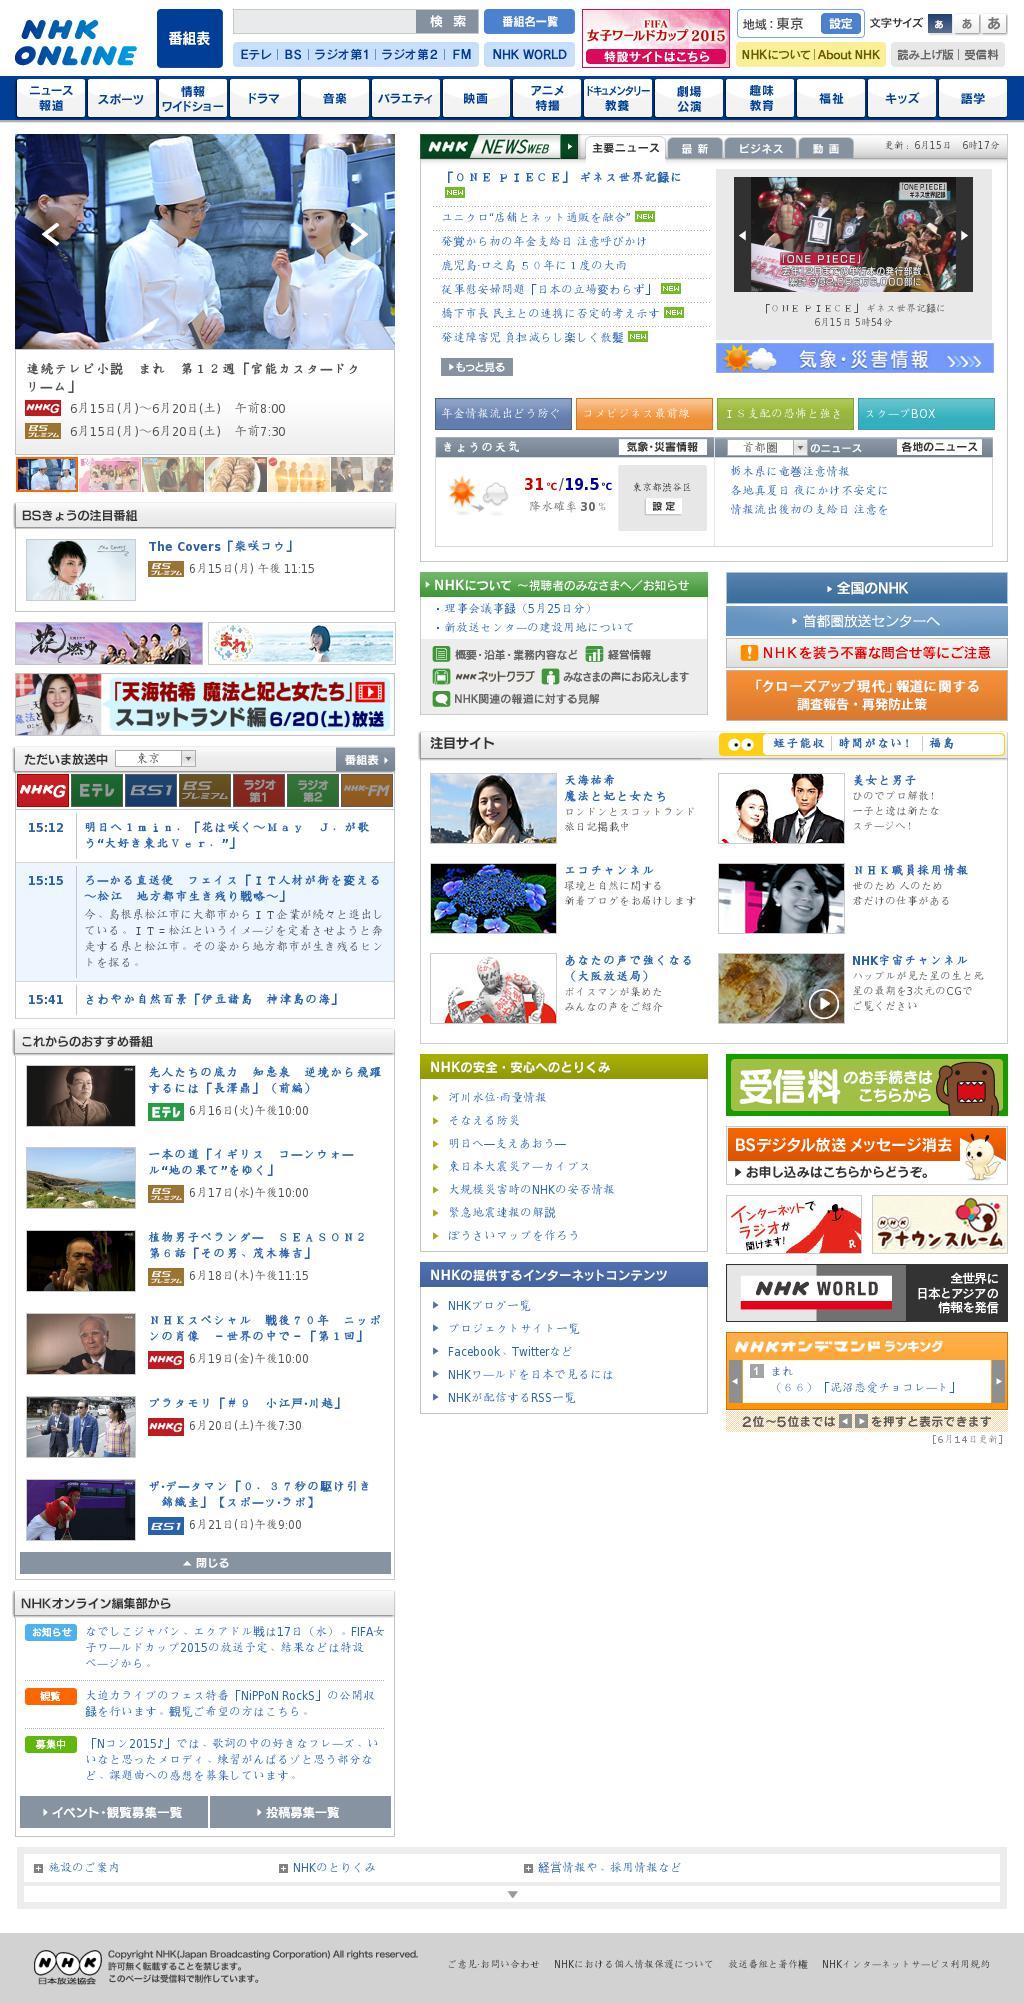 NHK Online at Monday June 15, 2015, 6:22 a.m. UTC